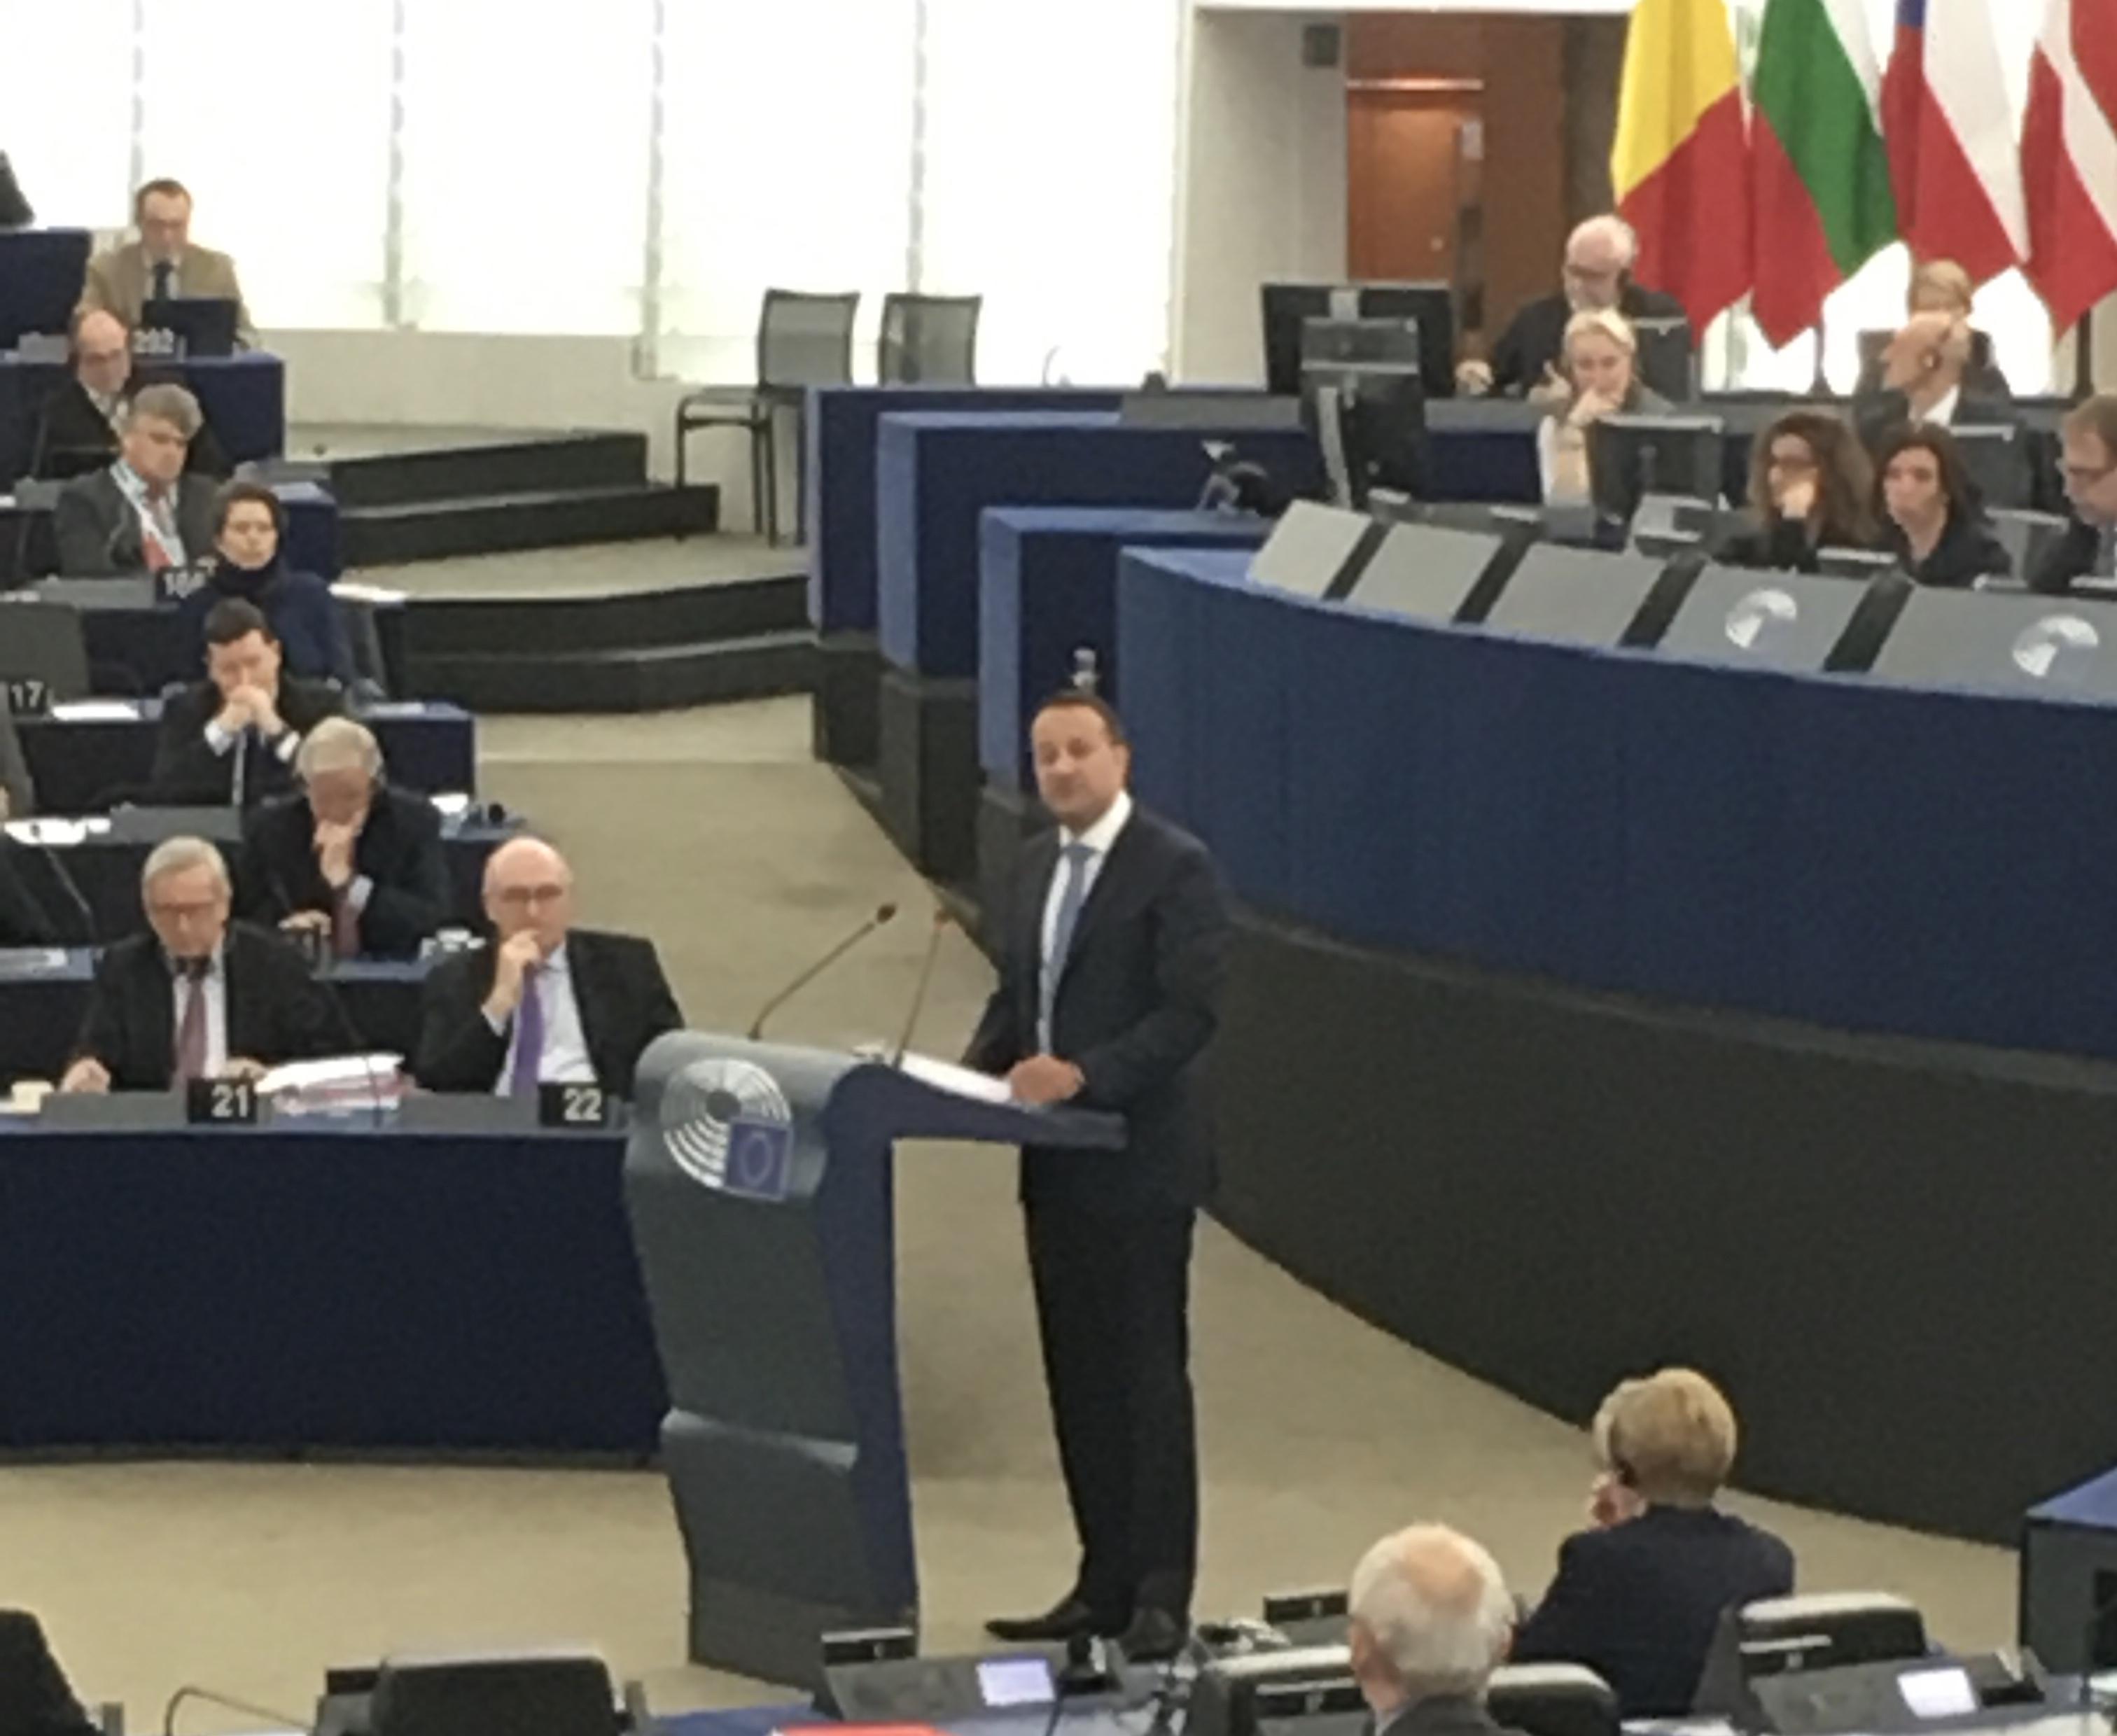 The Taoiseach, the Parliament and the Irish Border